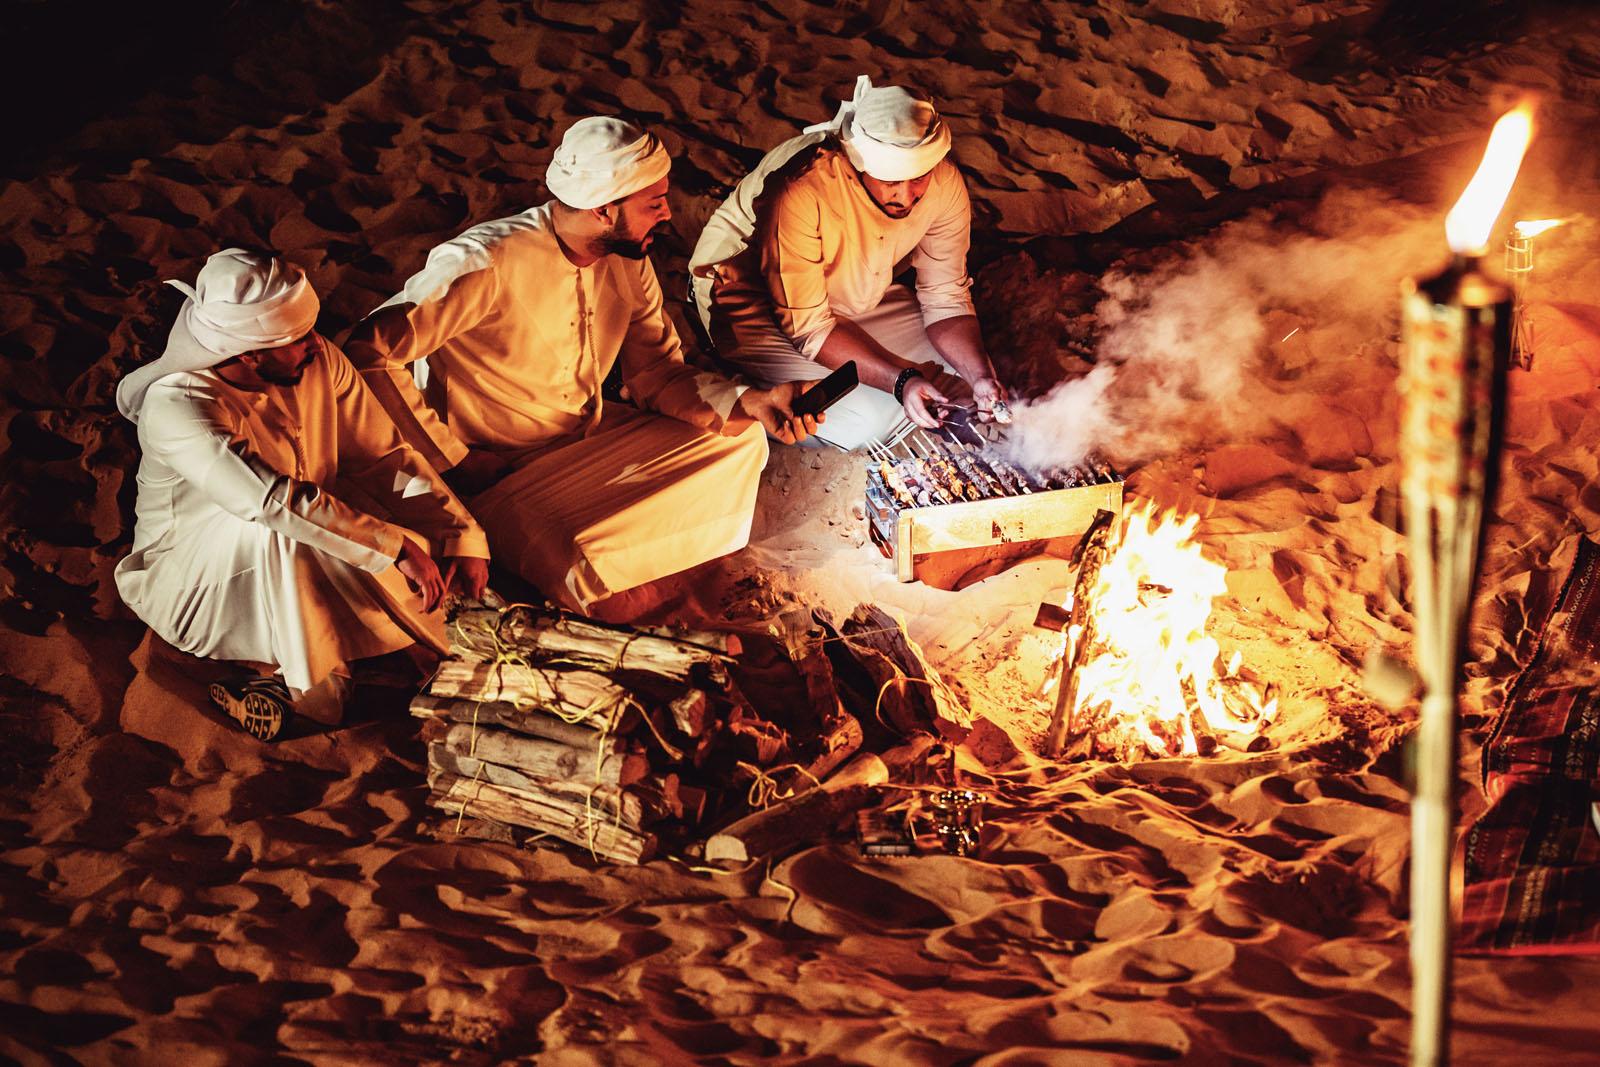 Brotherhood, Friends, Arabs, Dubai - Arab Friends Seated Around the Bonfire at a Desert Camp and Enjoying a Casual Conversation